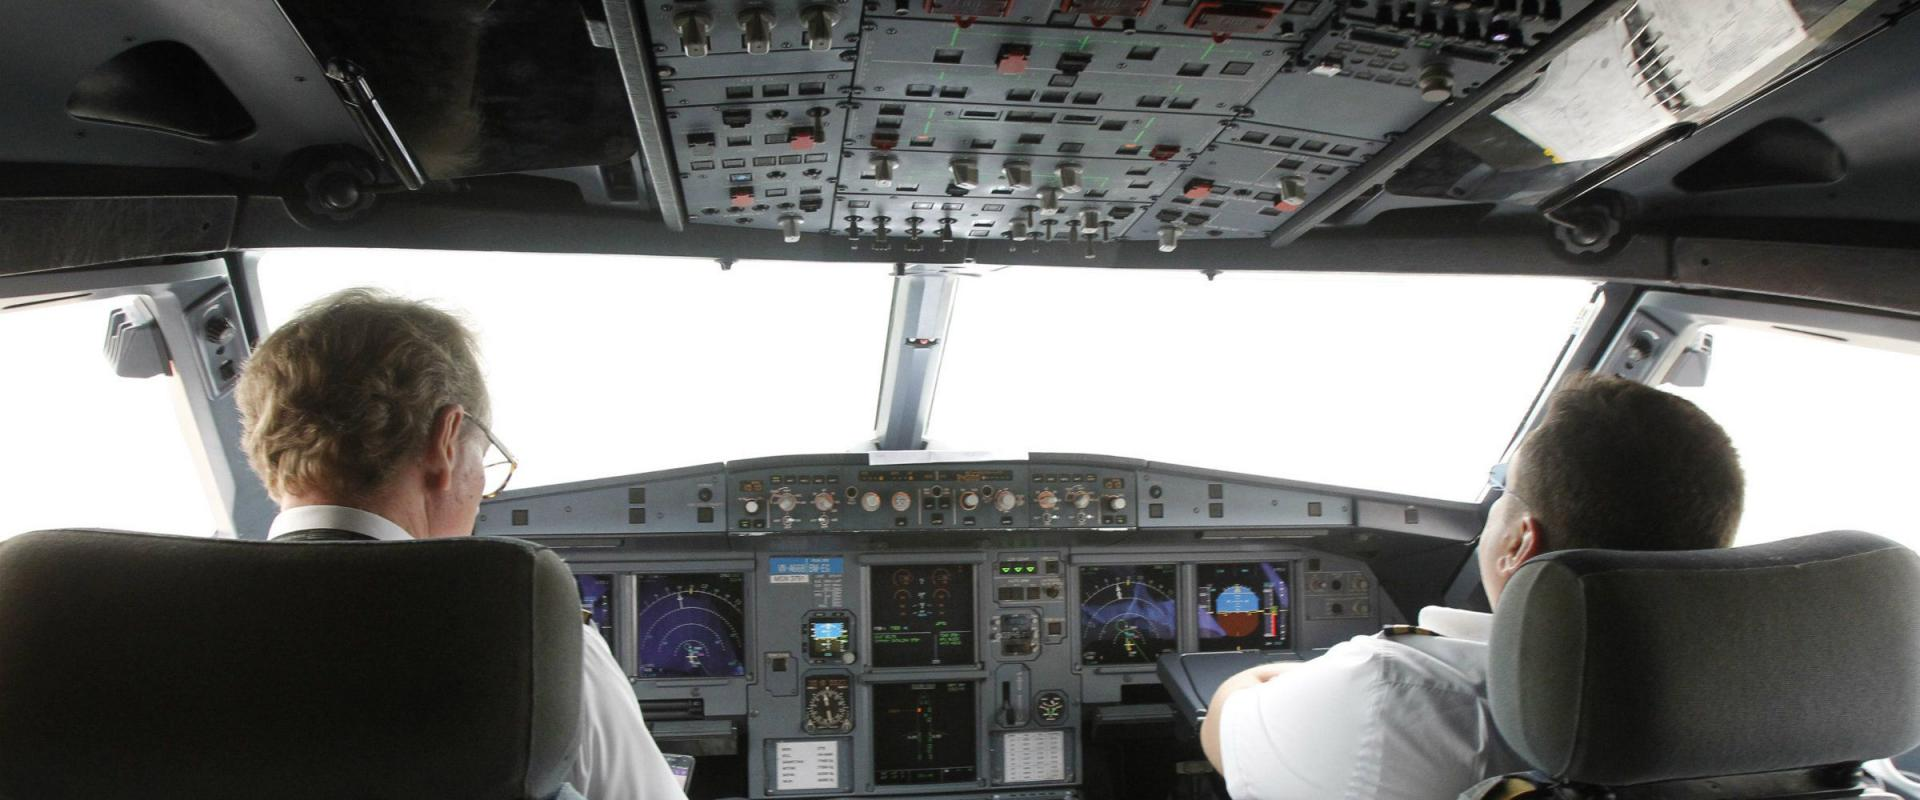 Cockpit vi